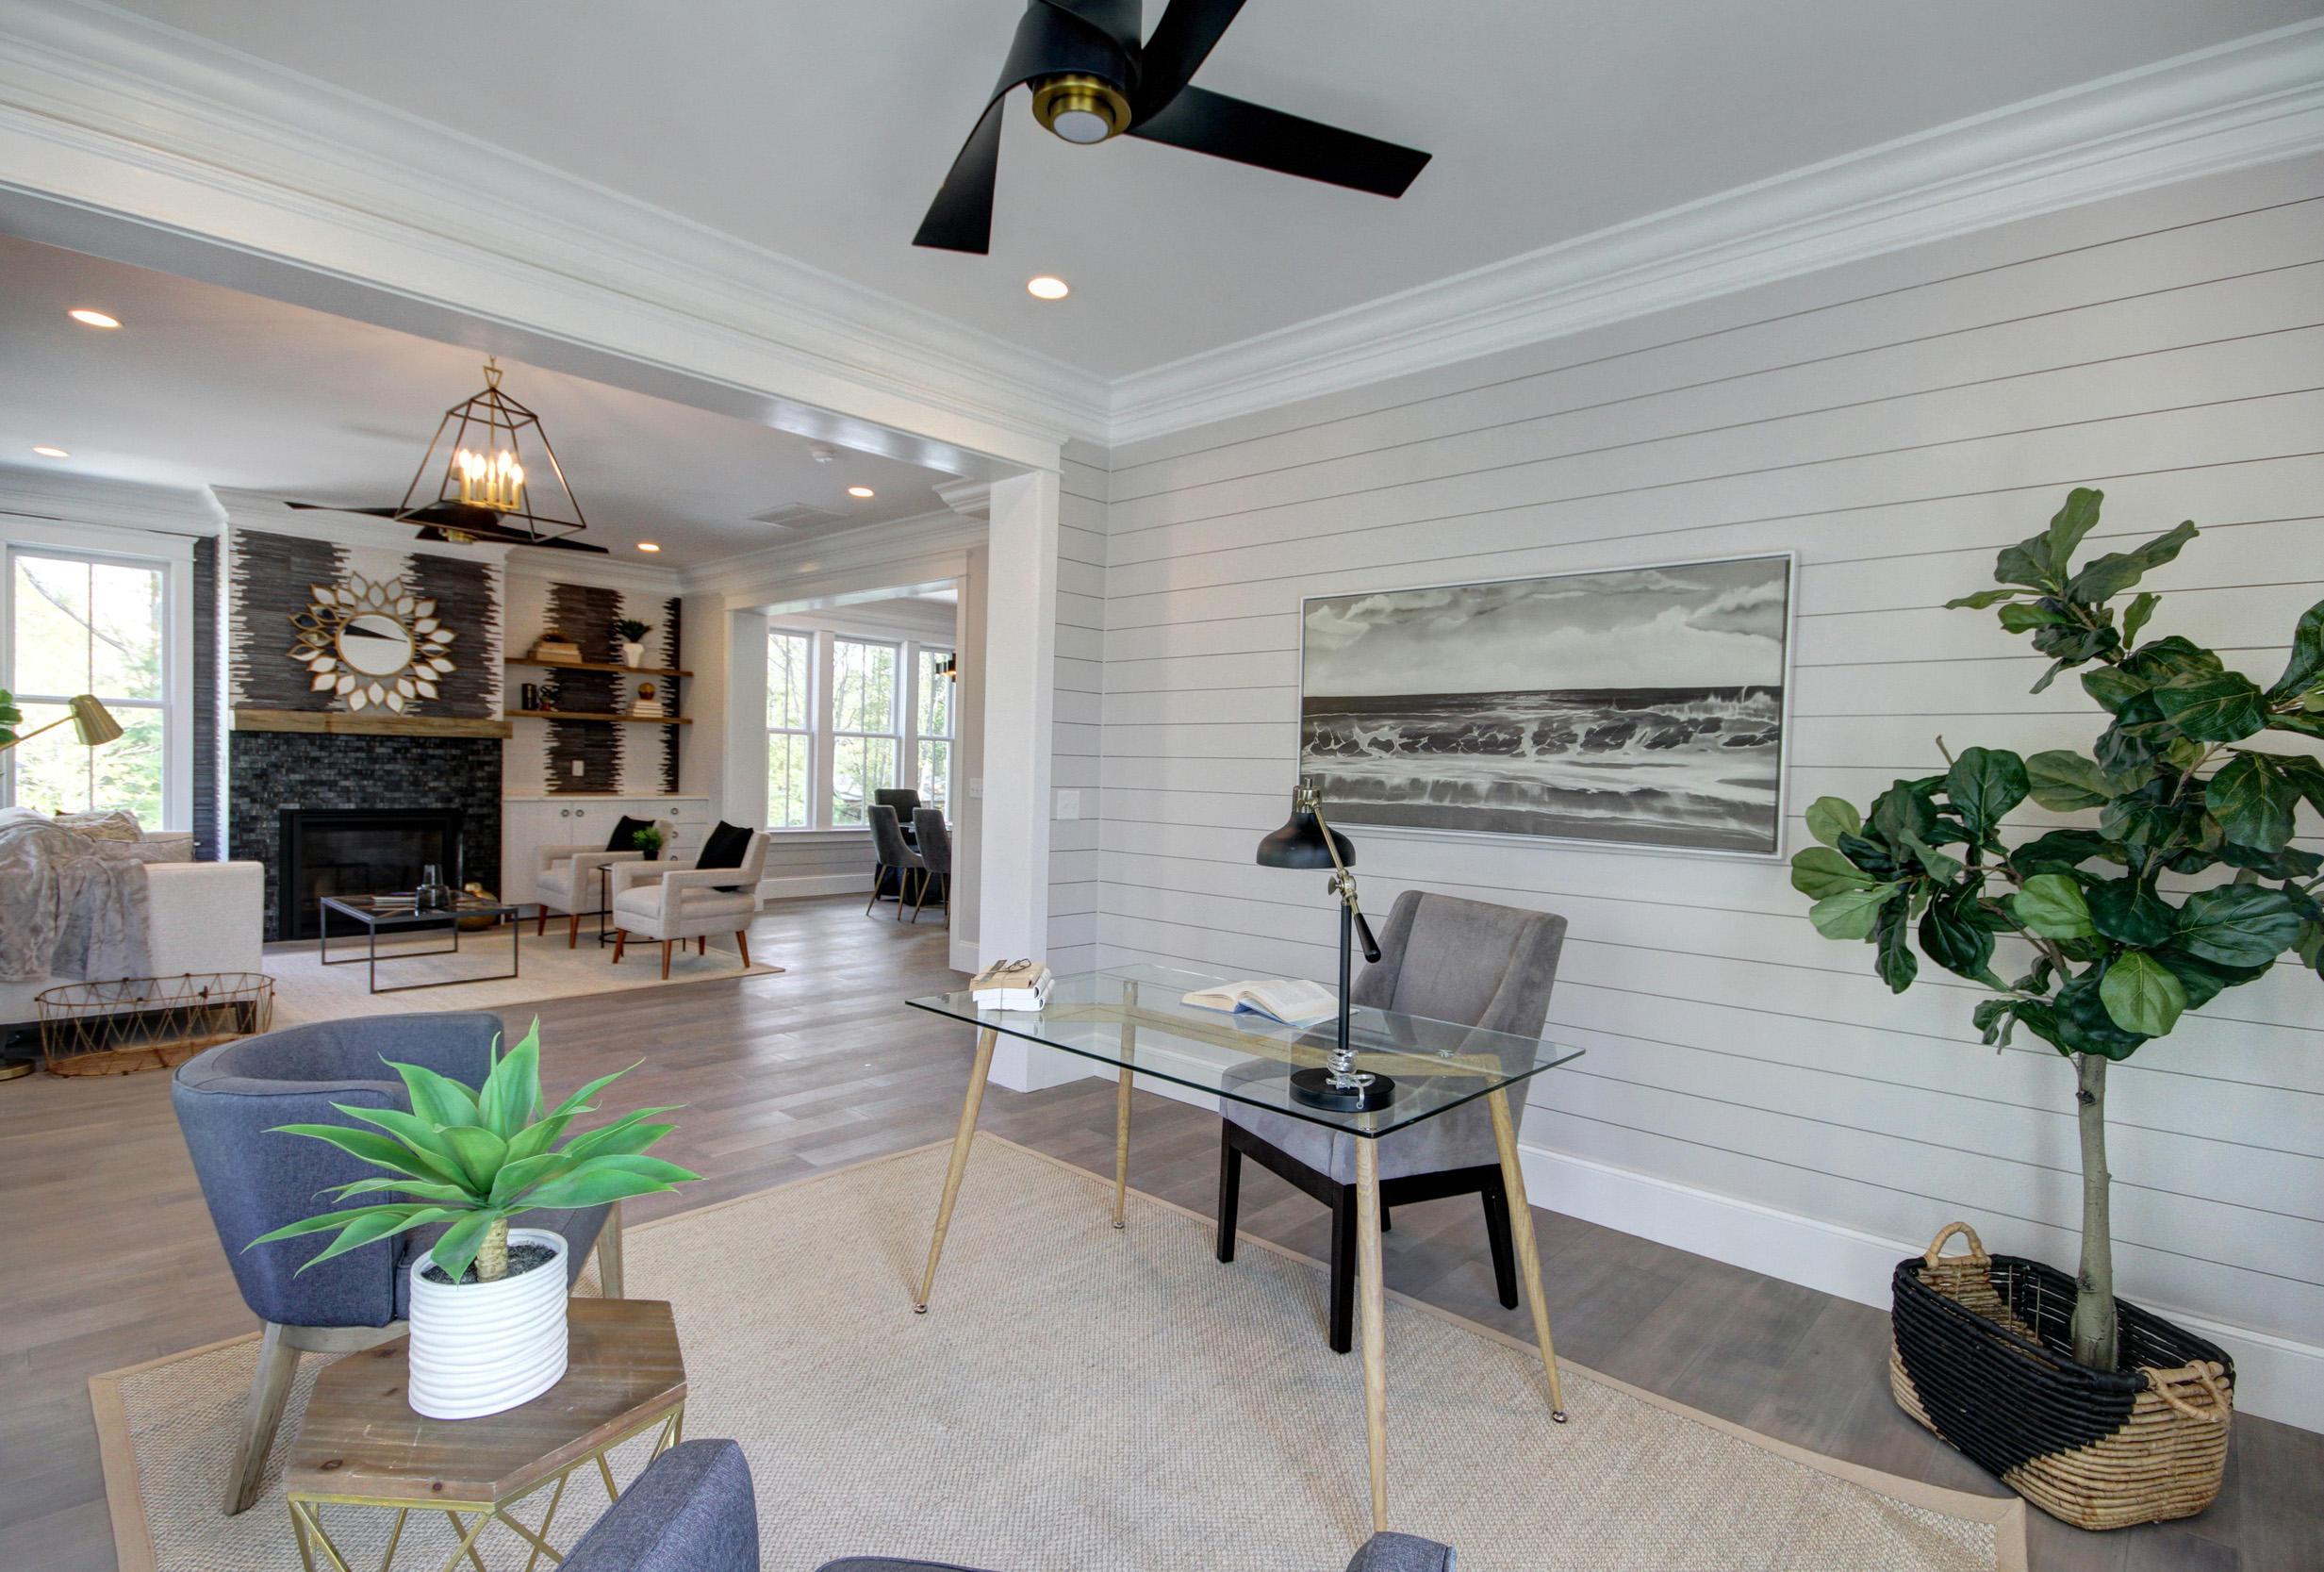 Mathis Ferry Court Homes For Sale - 1212 Clonmel, Mount Pleasant, SC - 12